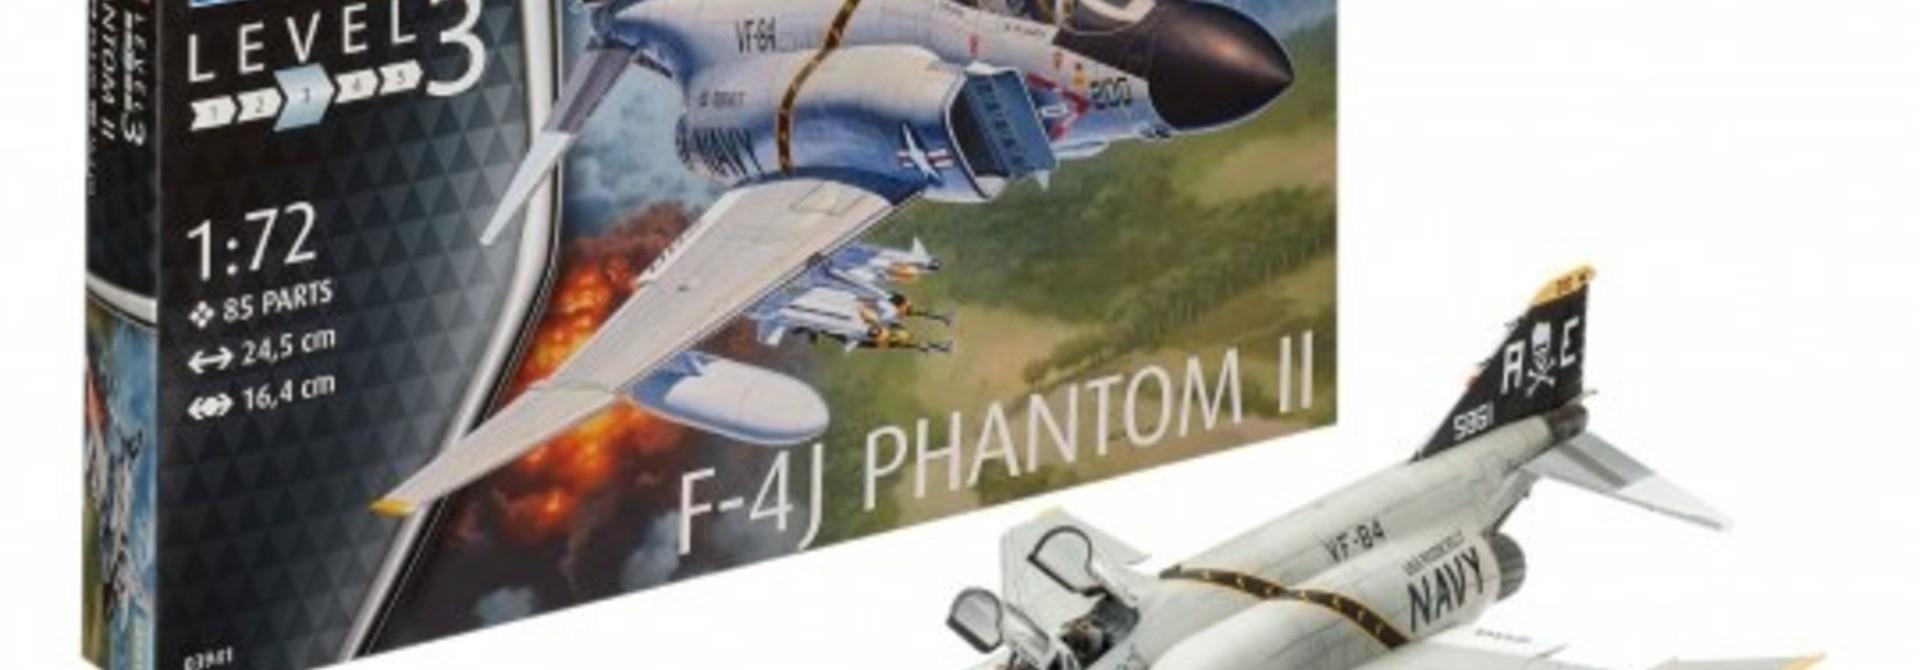 1:72 F-4J Phantom II